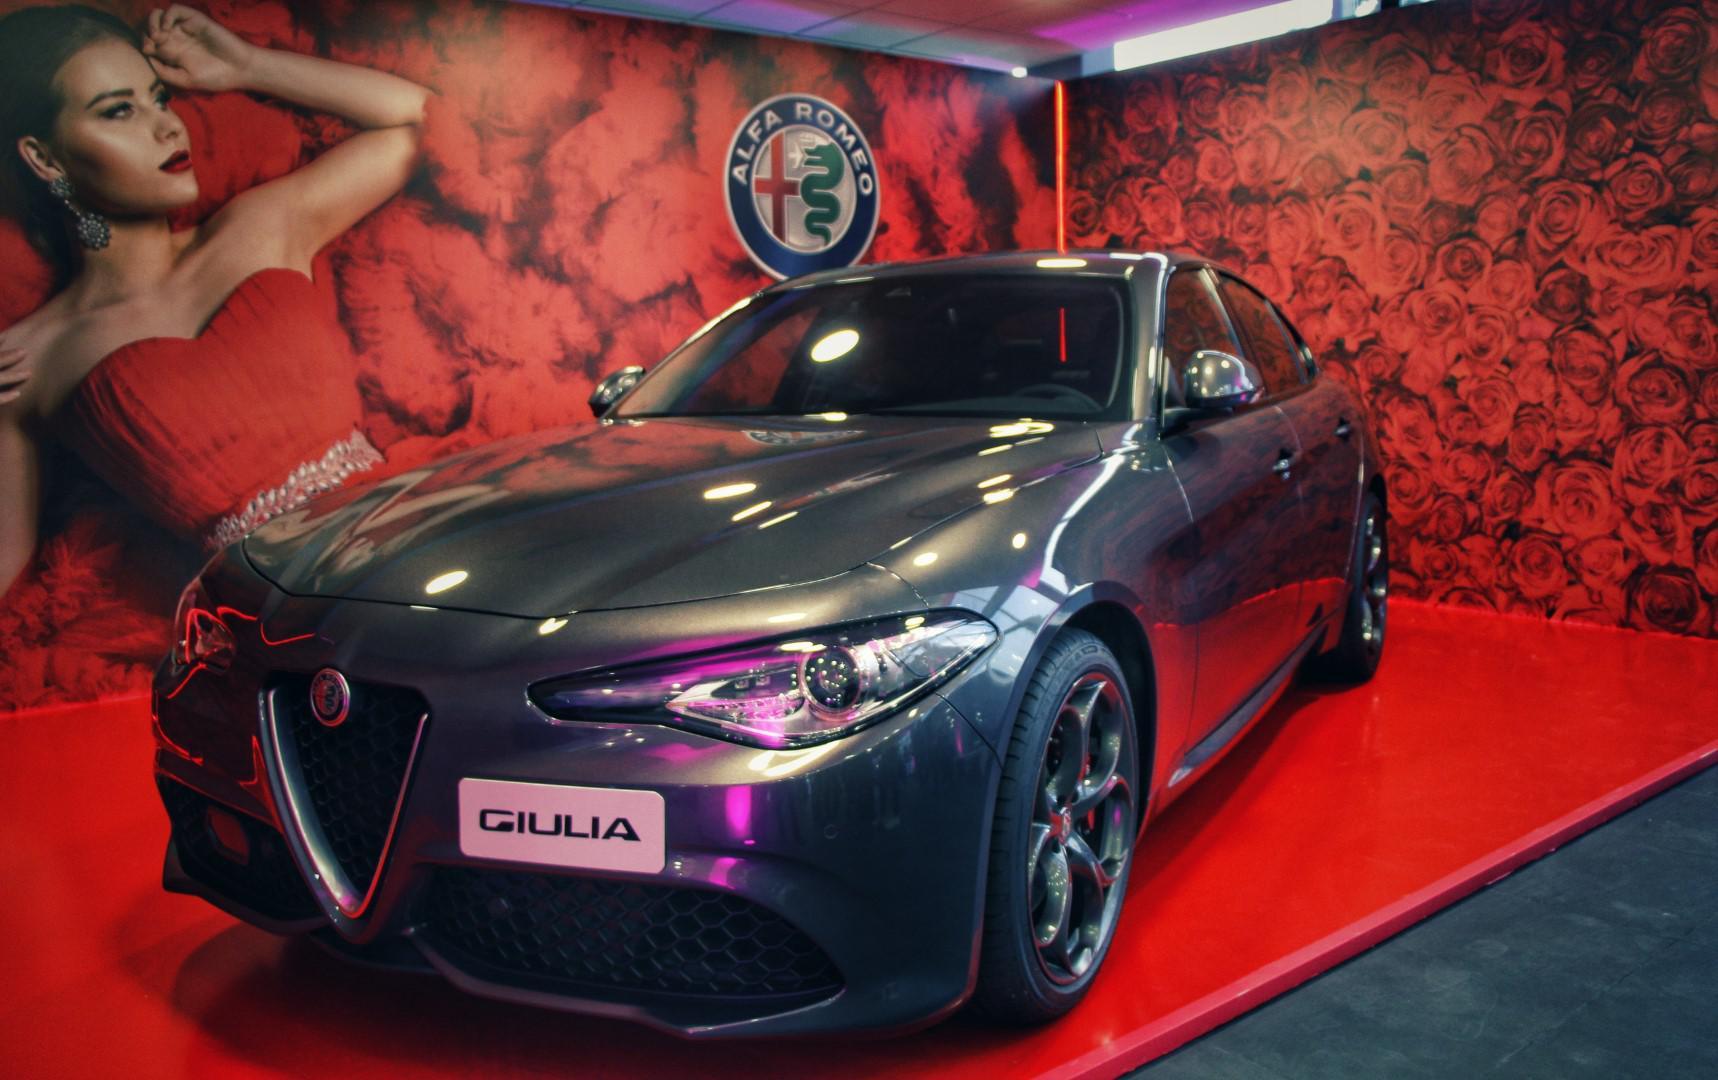 orbis-automotive-inaugure-son-nouveau-showroom-a-rabat-1119-2.jpg